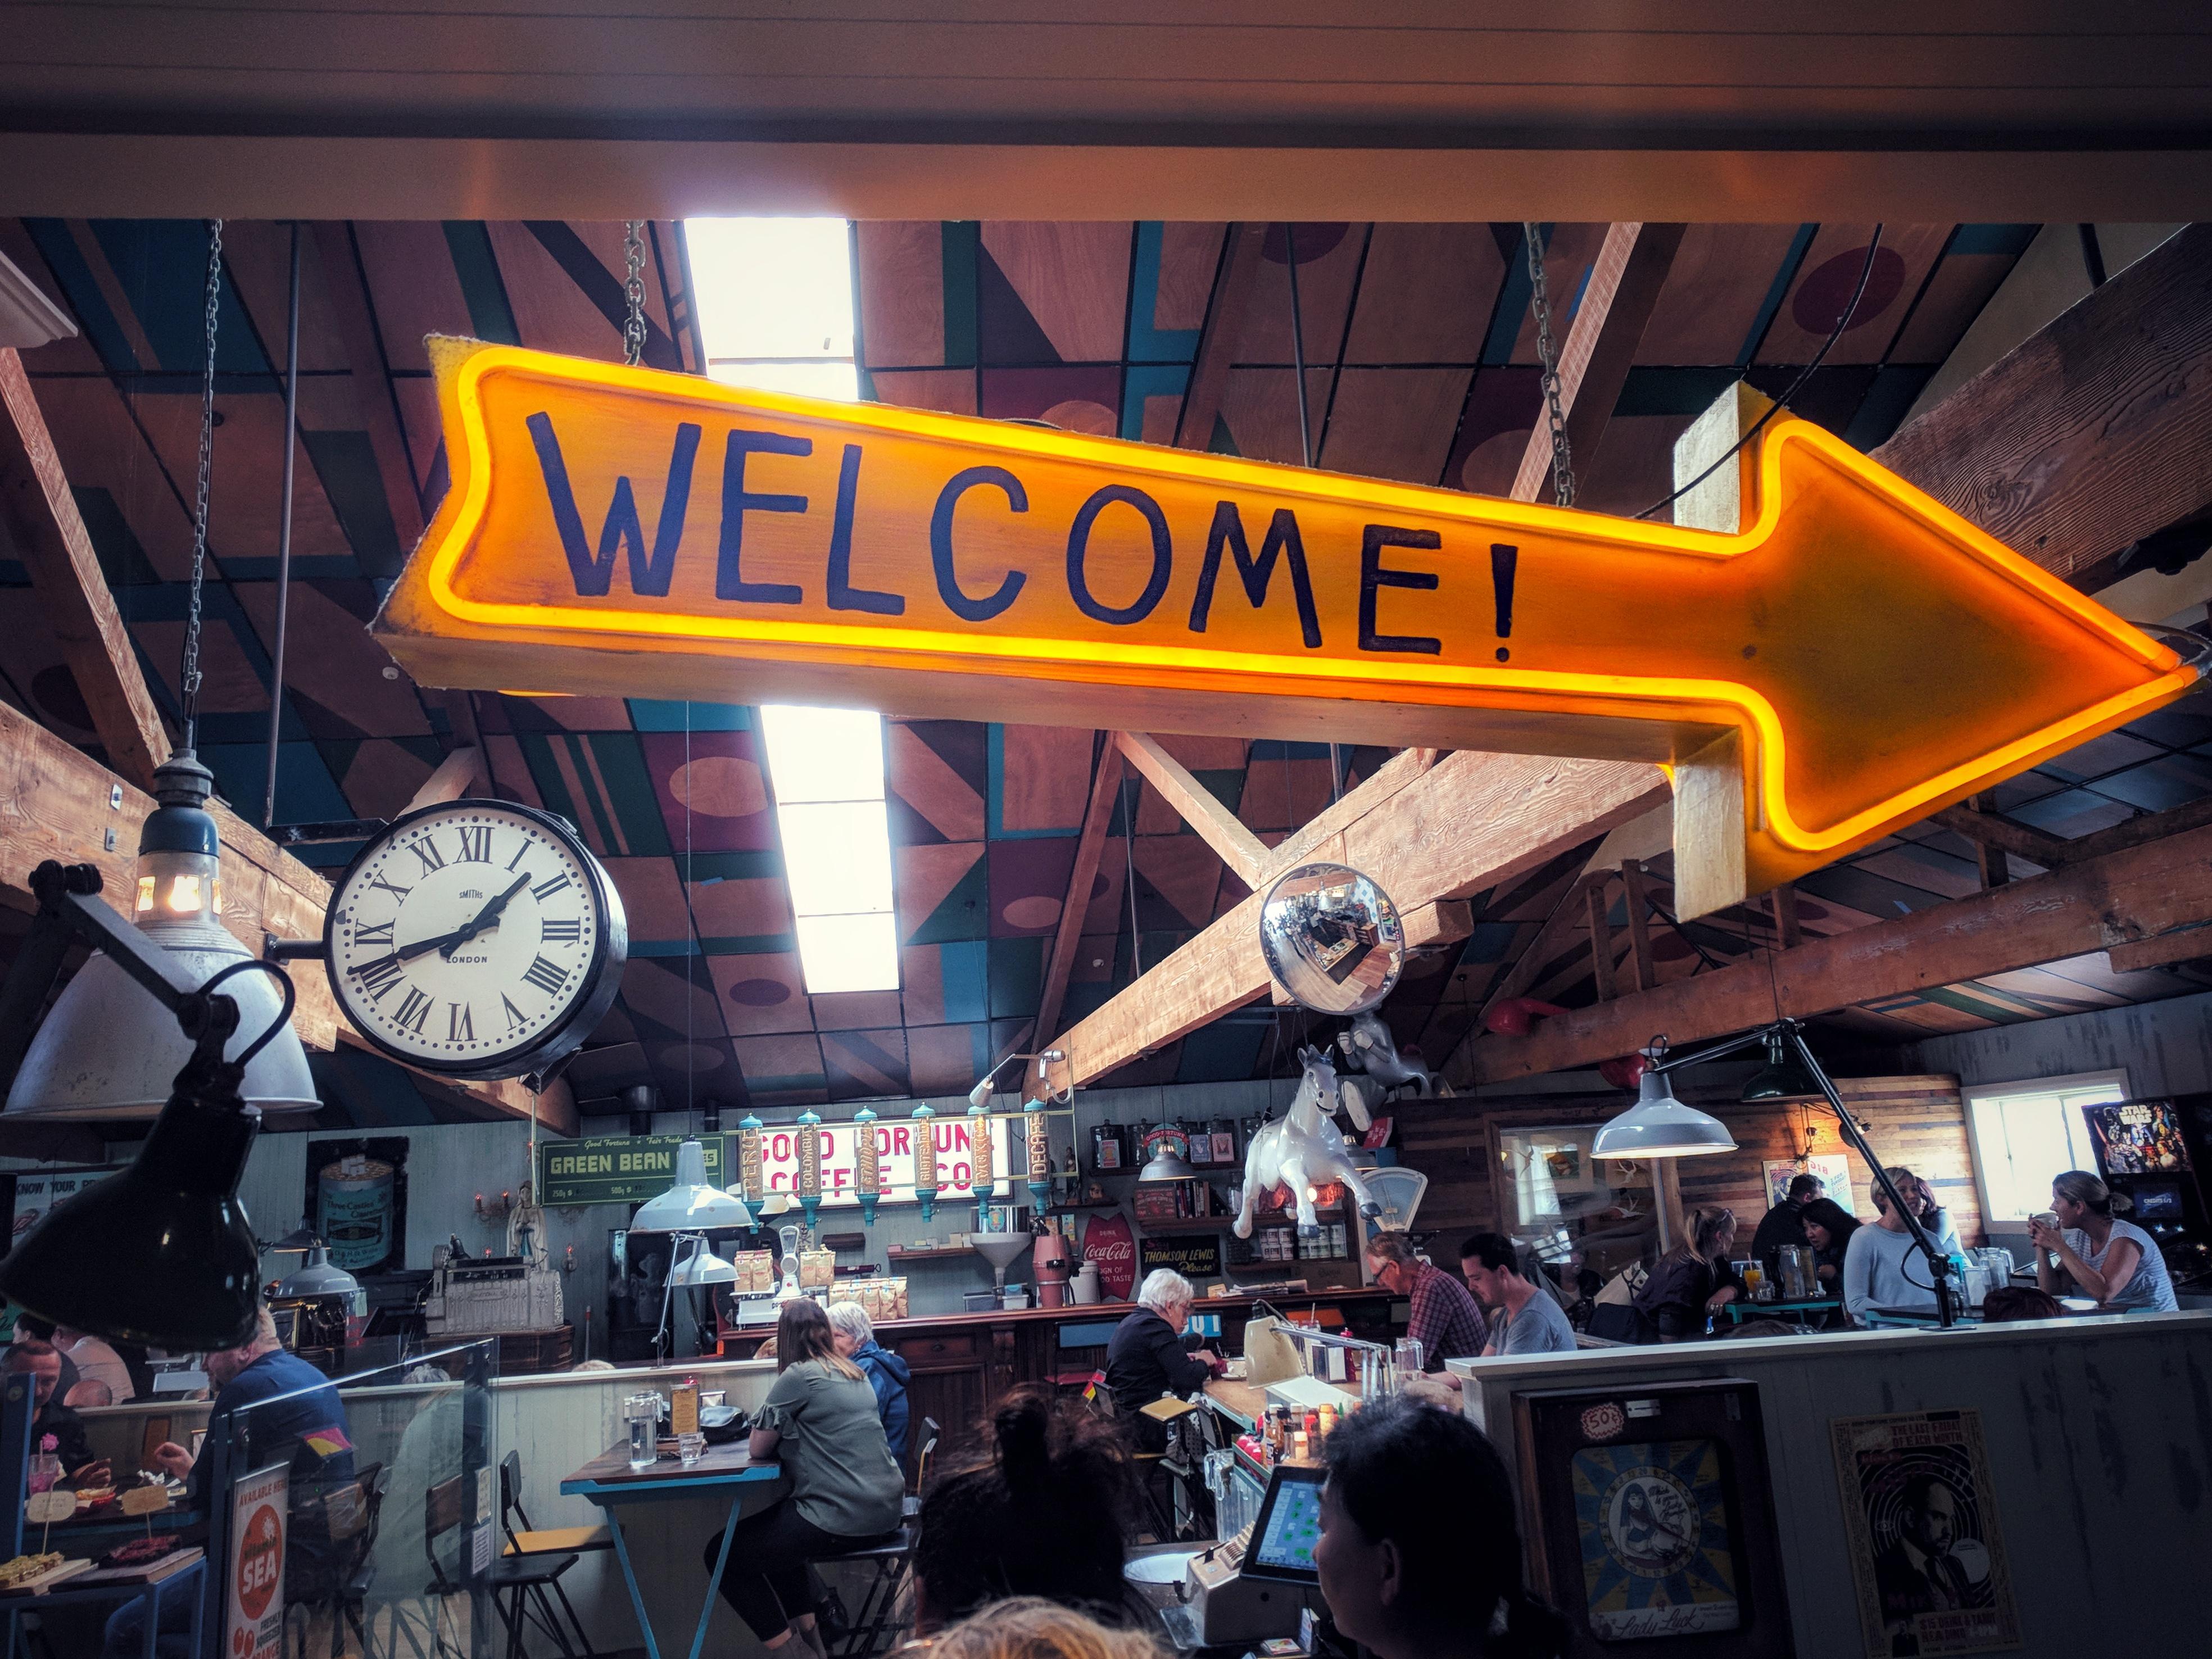 Seashore Cabaret welcome sign